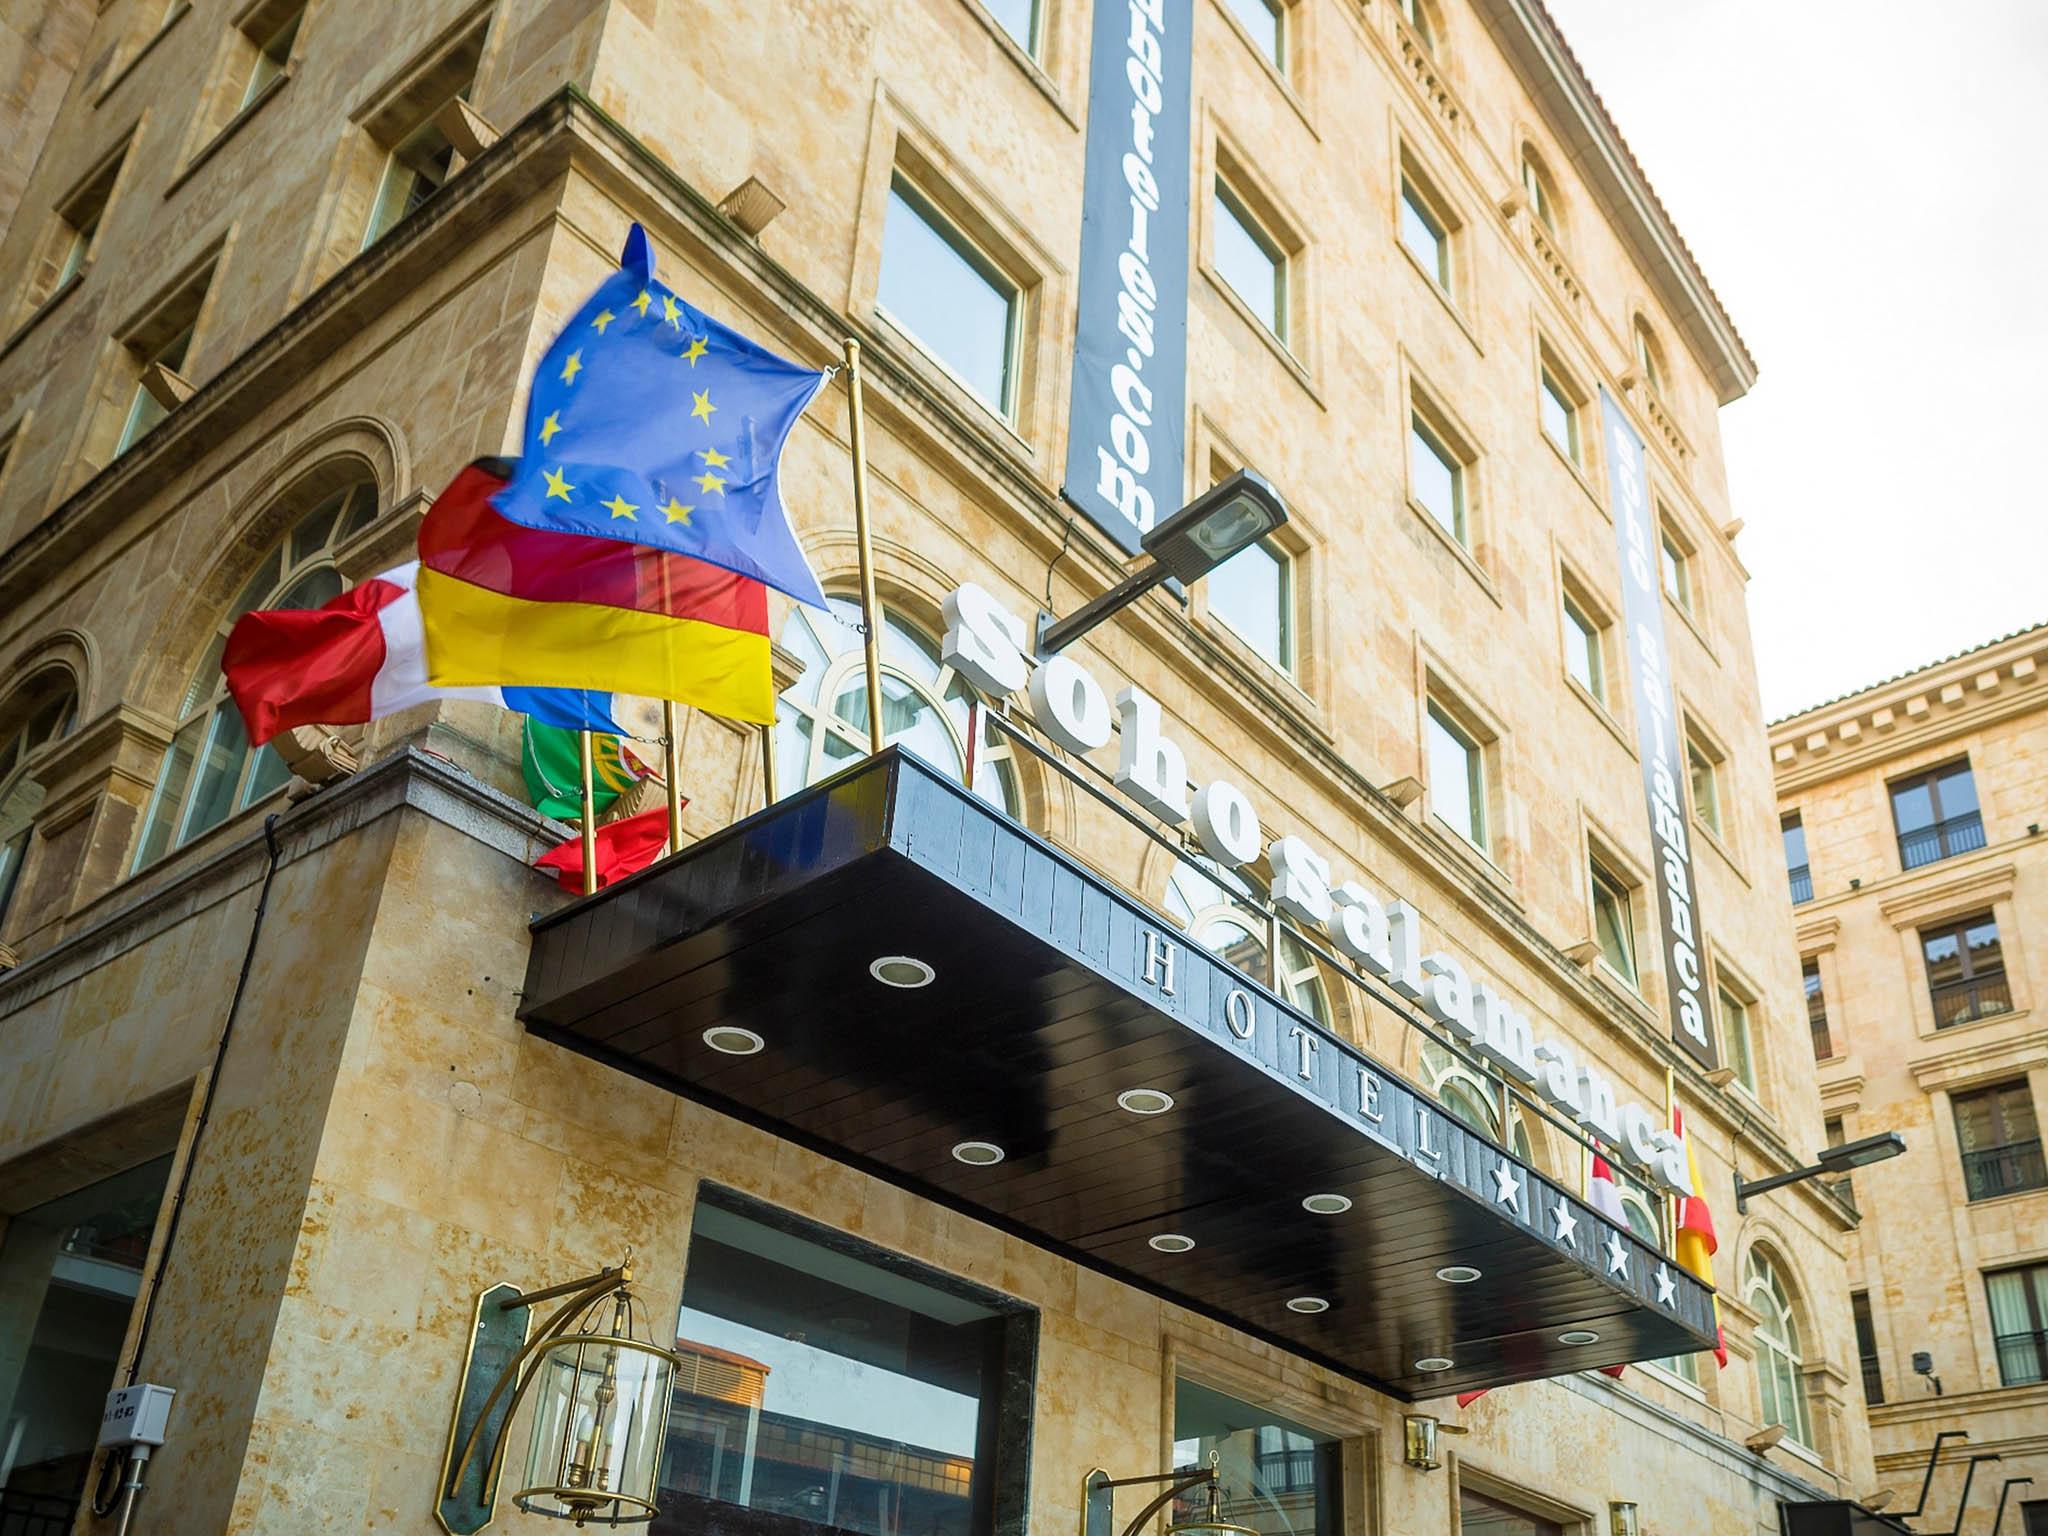 Hotel en salamanca soho boutique salamanca - Hotel salamanca 5 estrellas ...